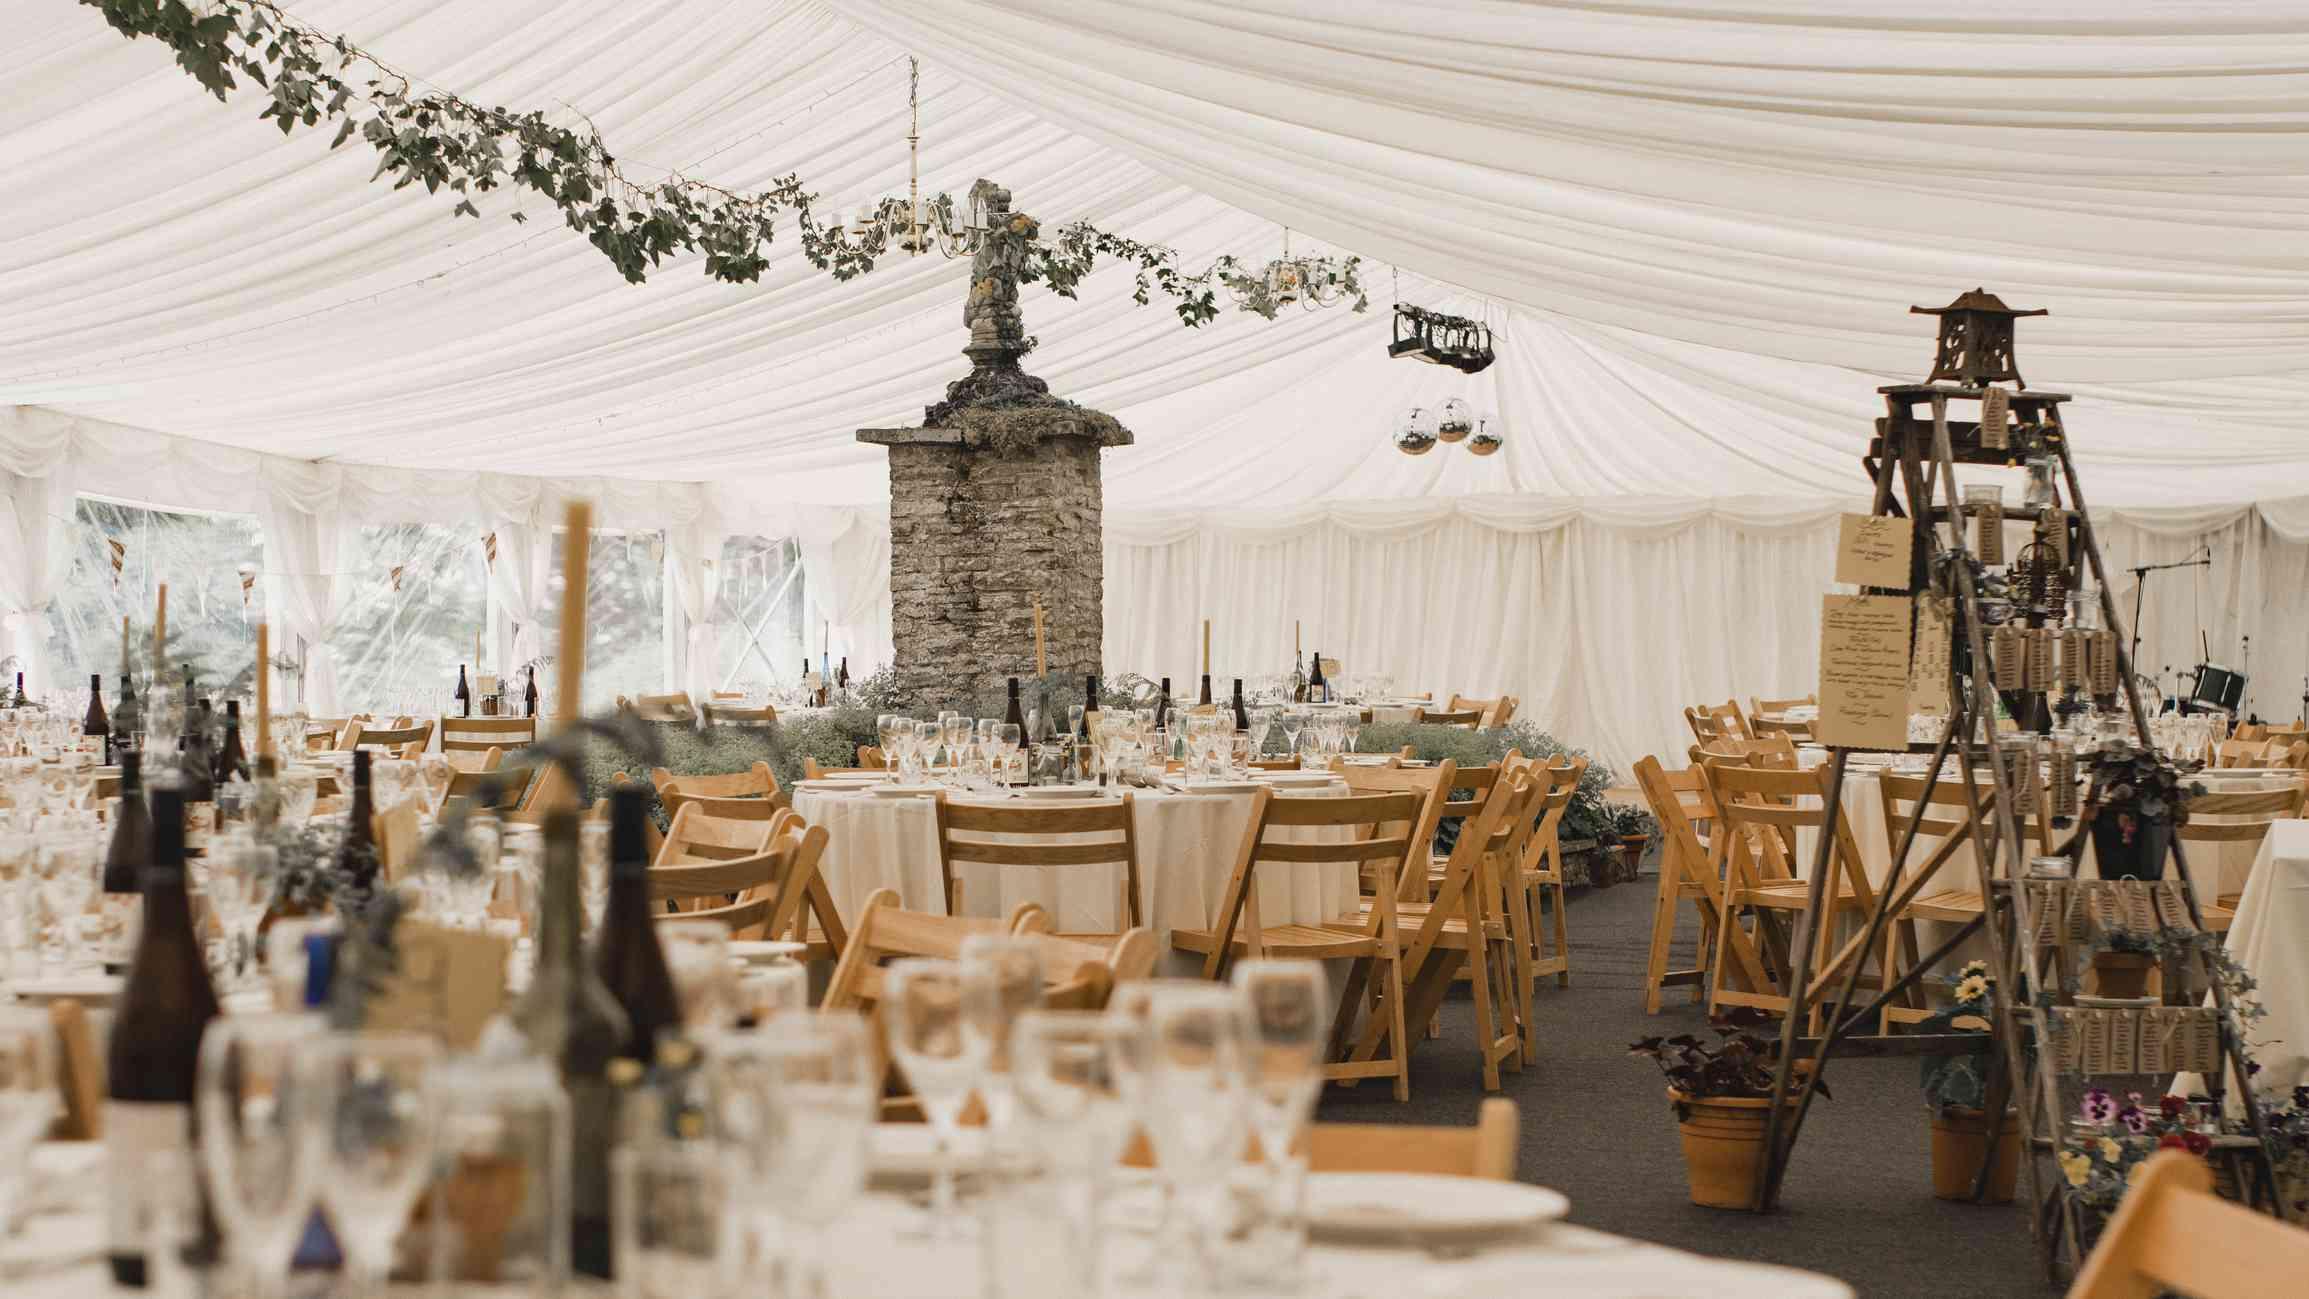 Wedding reception seating beneath tent